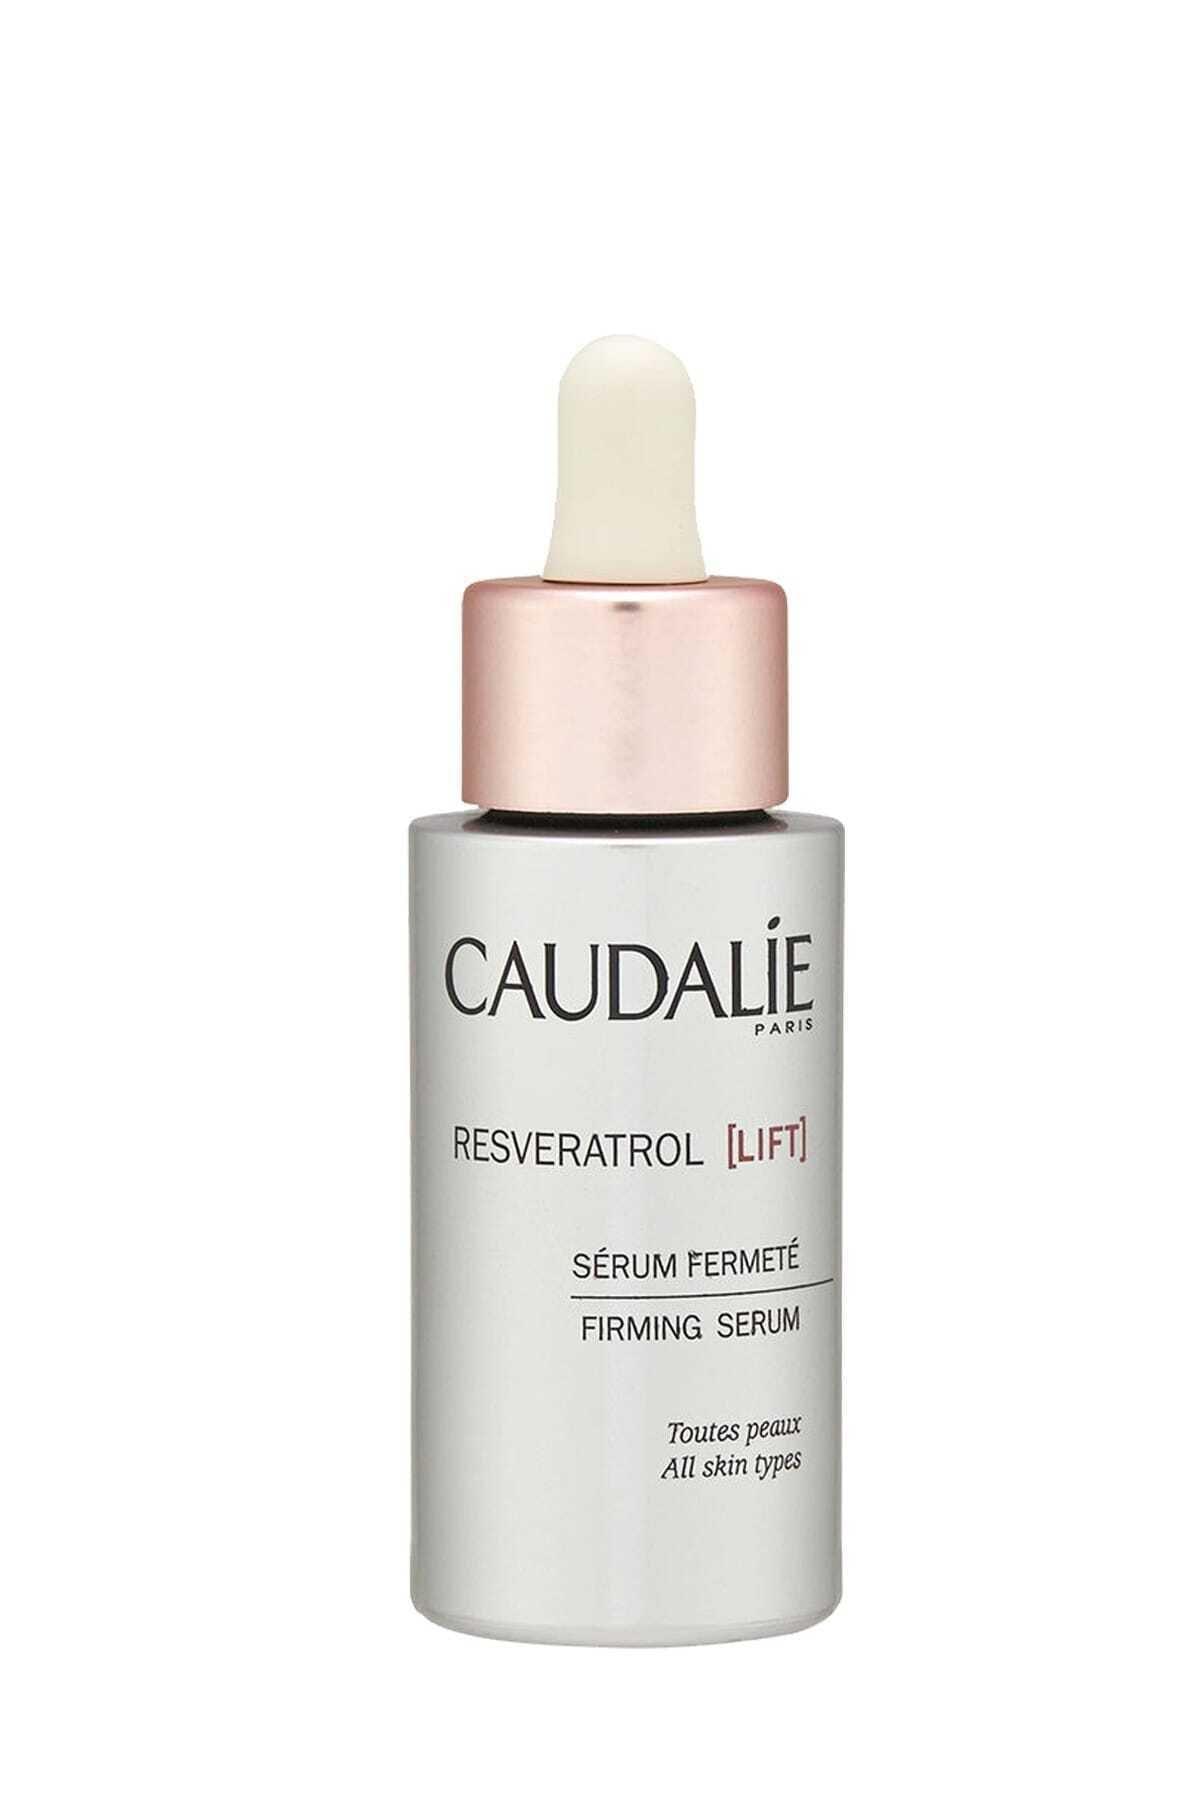 Caudalie Resveratrol Lift Firming Serum 30ml 1